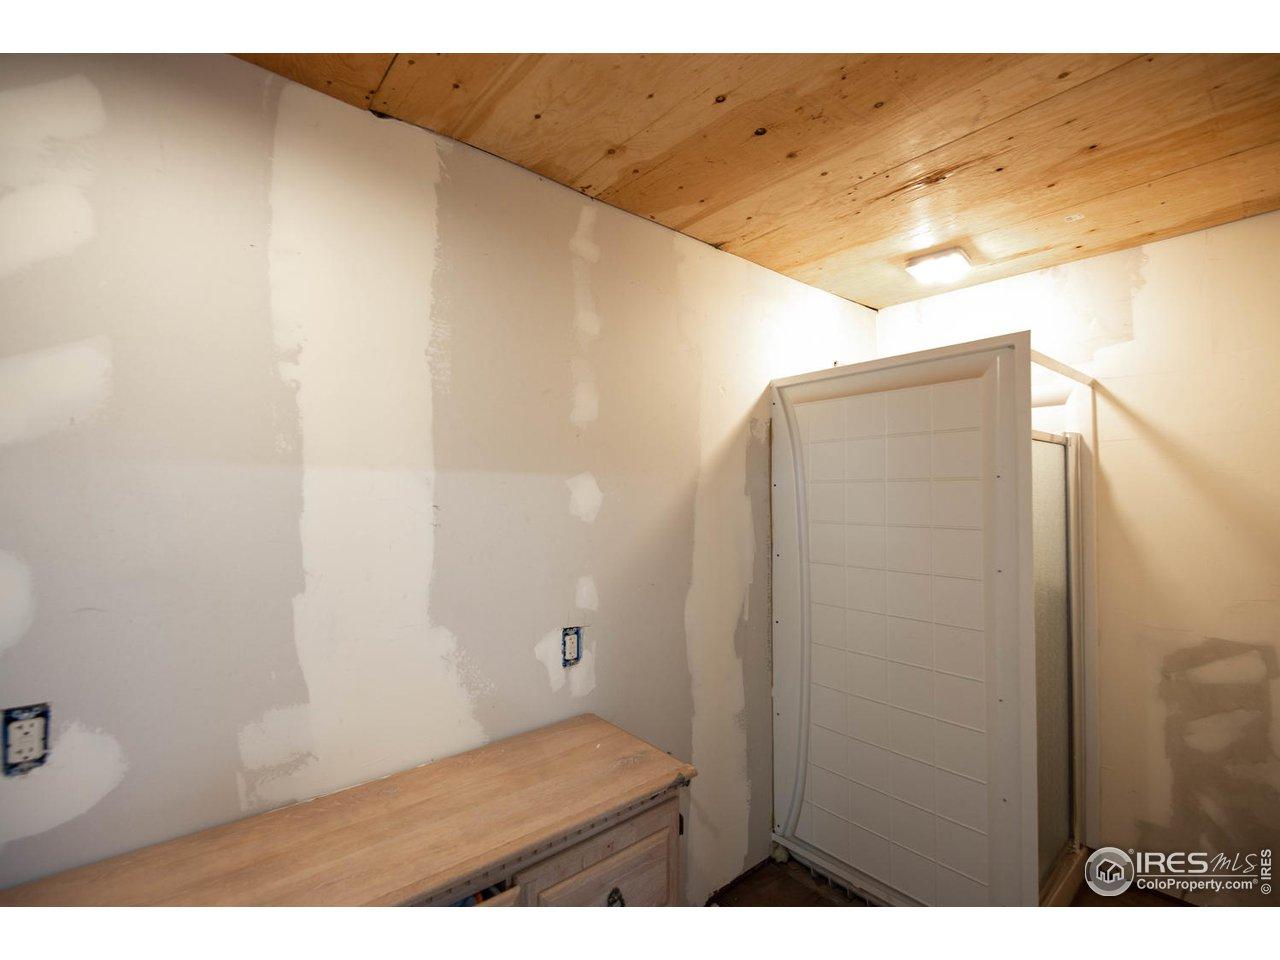 Shop Bath Area w/shower